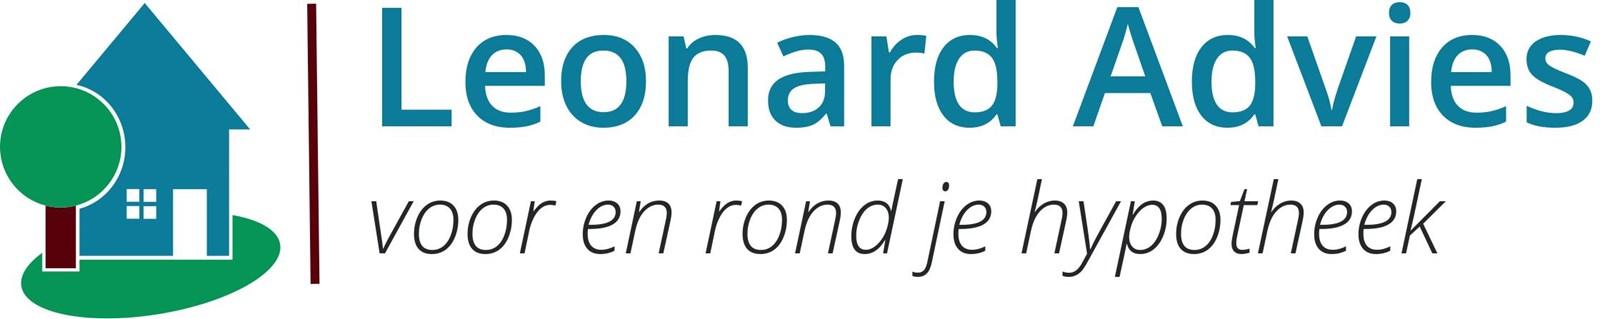 Logo van Leonard Advies